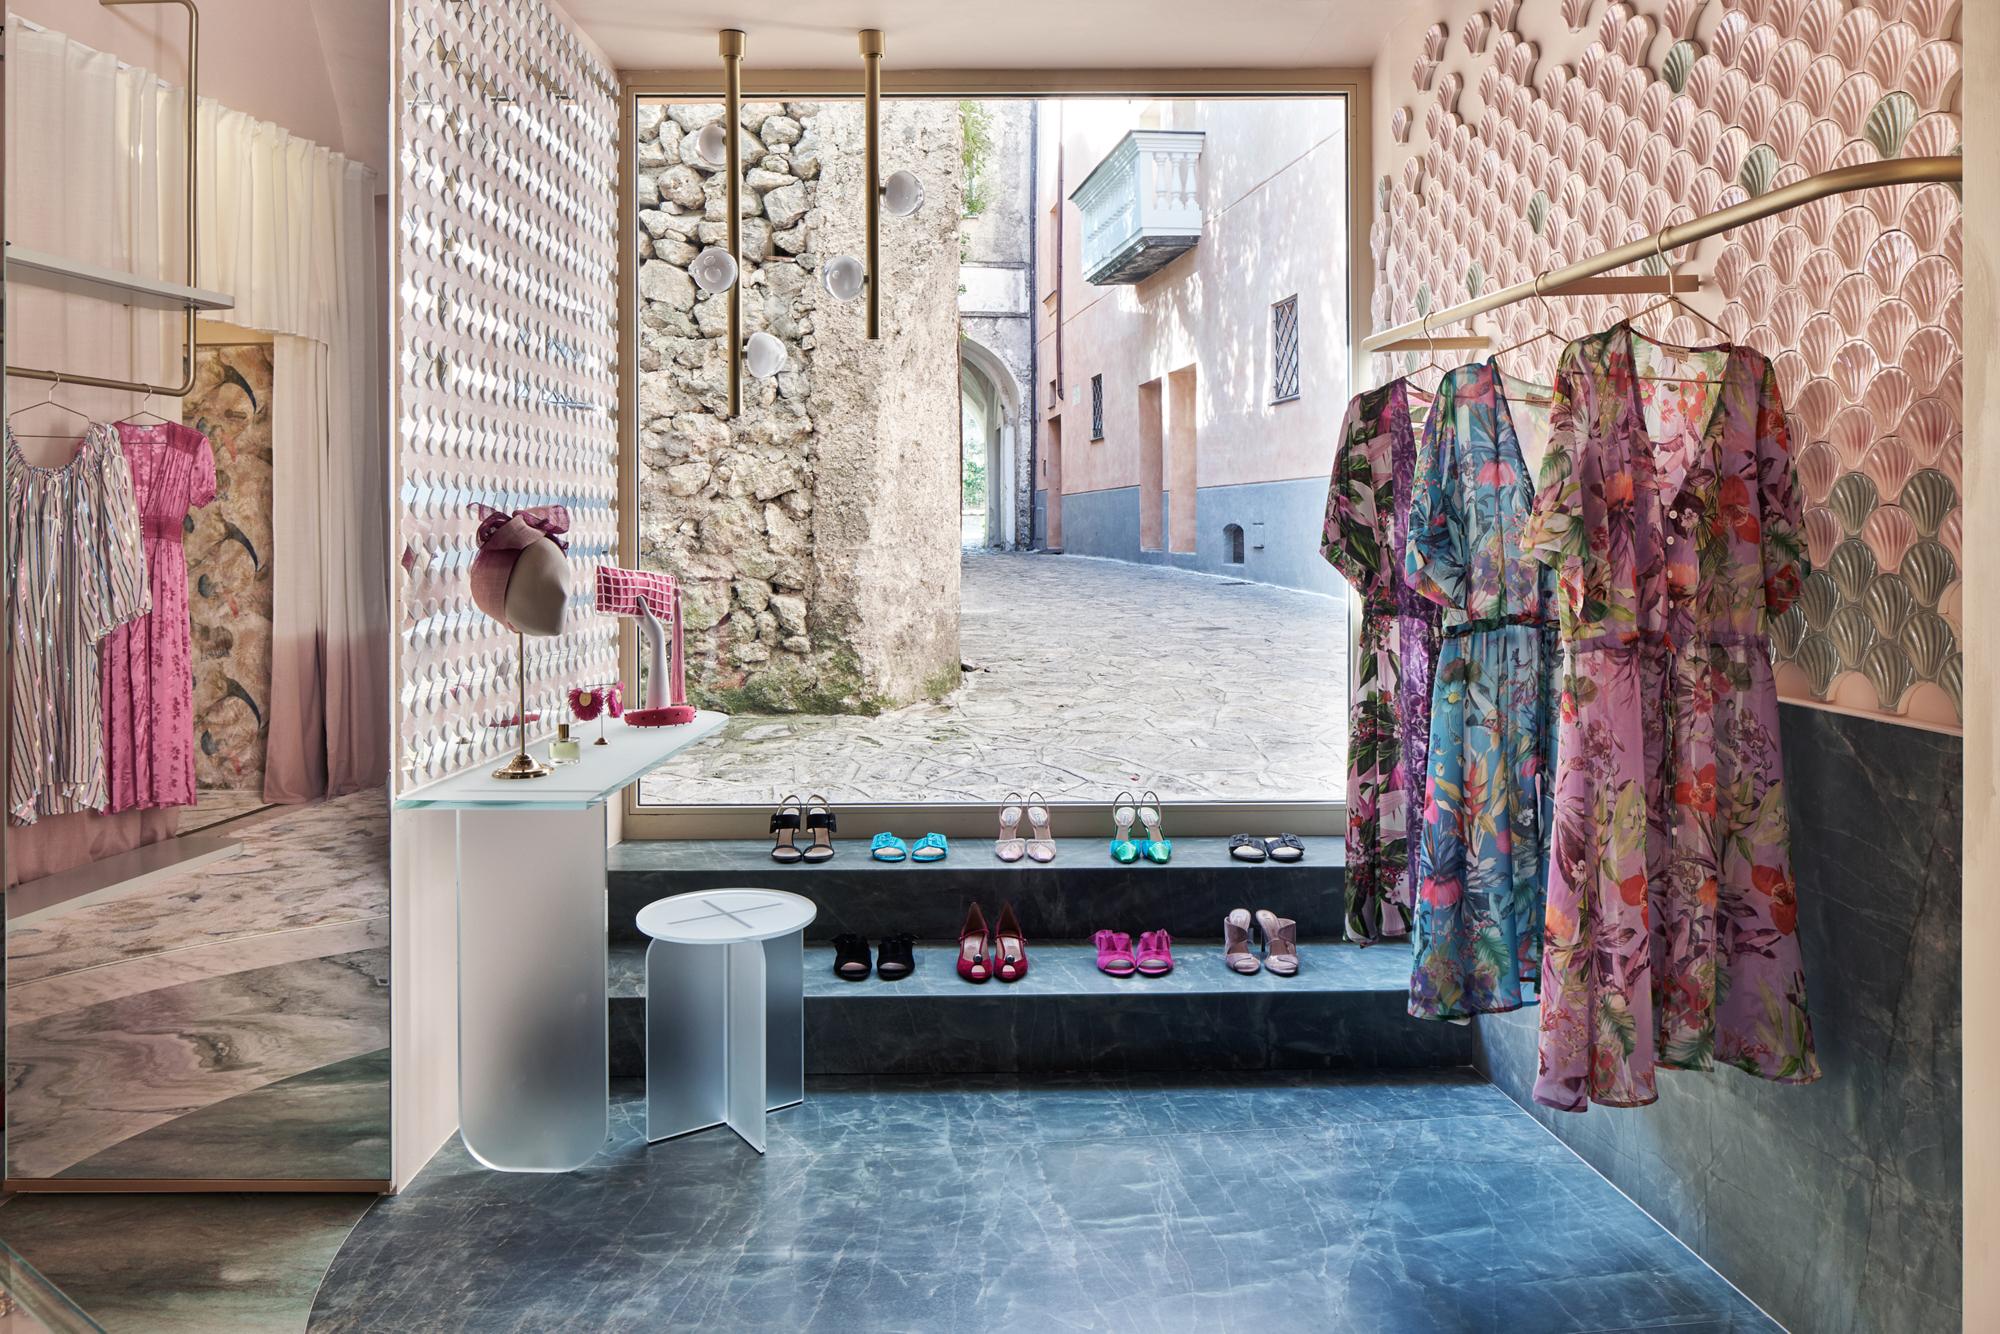 Boutique The Pink Closet für das Hotel Palazzo Avino in Ravello an der Amalfiküste. Foto:Davide Lovatti